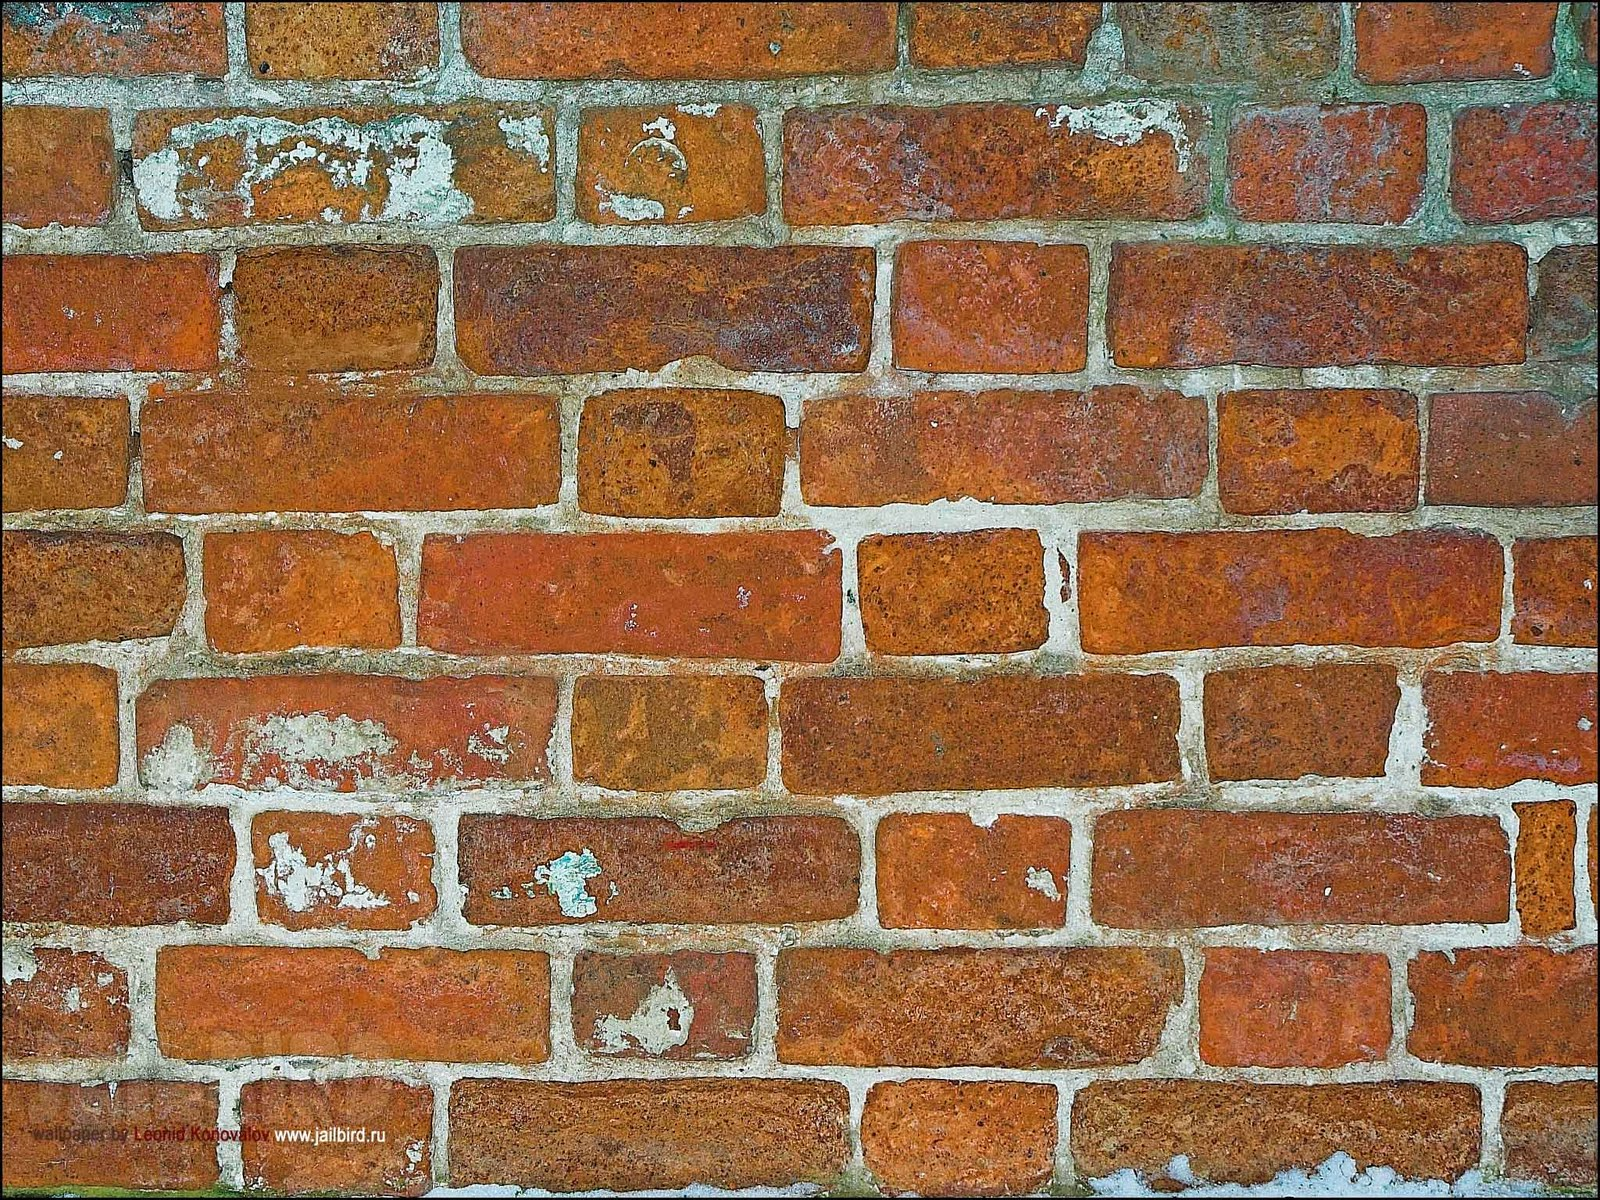 http://4.bp.blogspot.com/-Er1Nx82Vp5Y/TscZHMFecrI/AAAAAAAAA6U/2BTbGdACUBI/s1600/brick-wallpaper-hd-7-739961.jpg